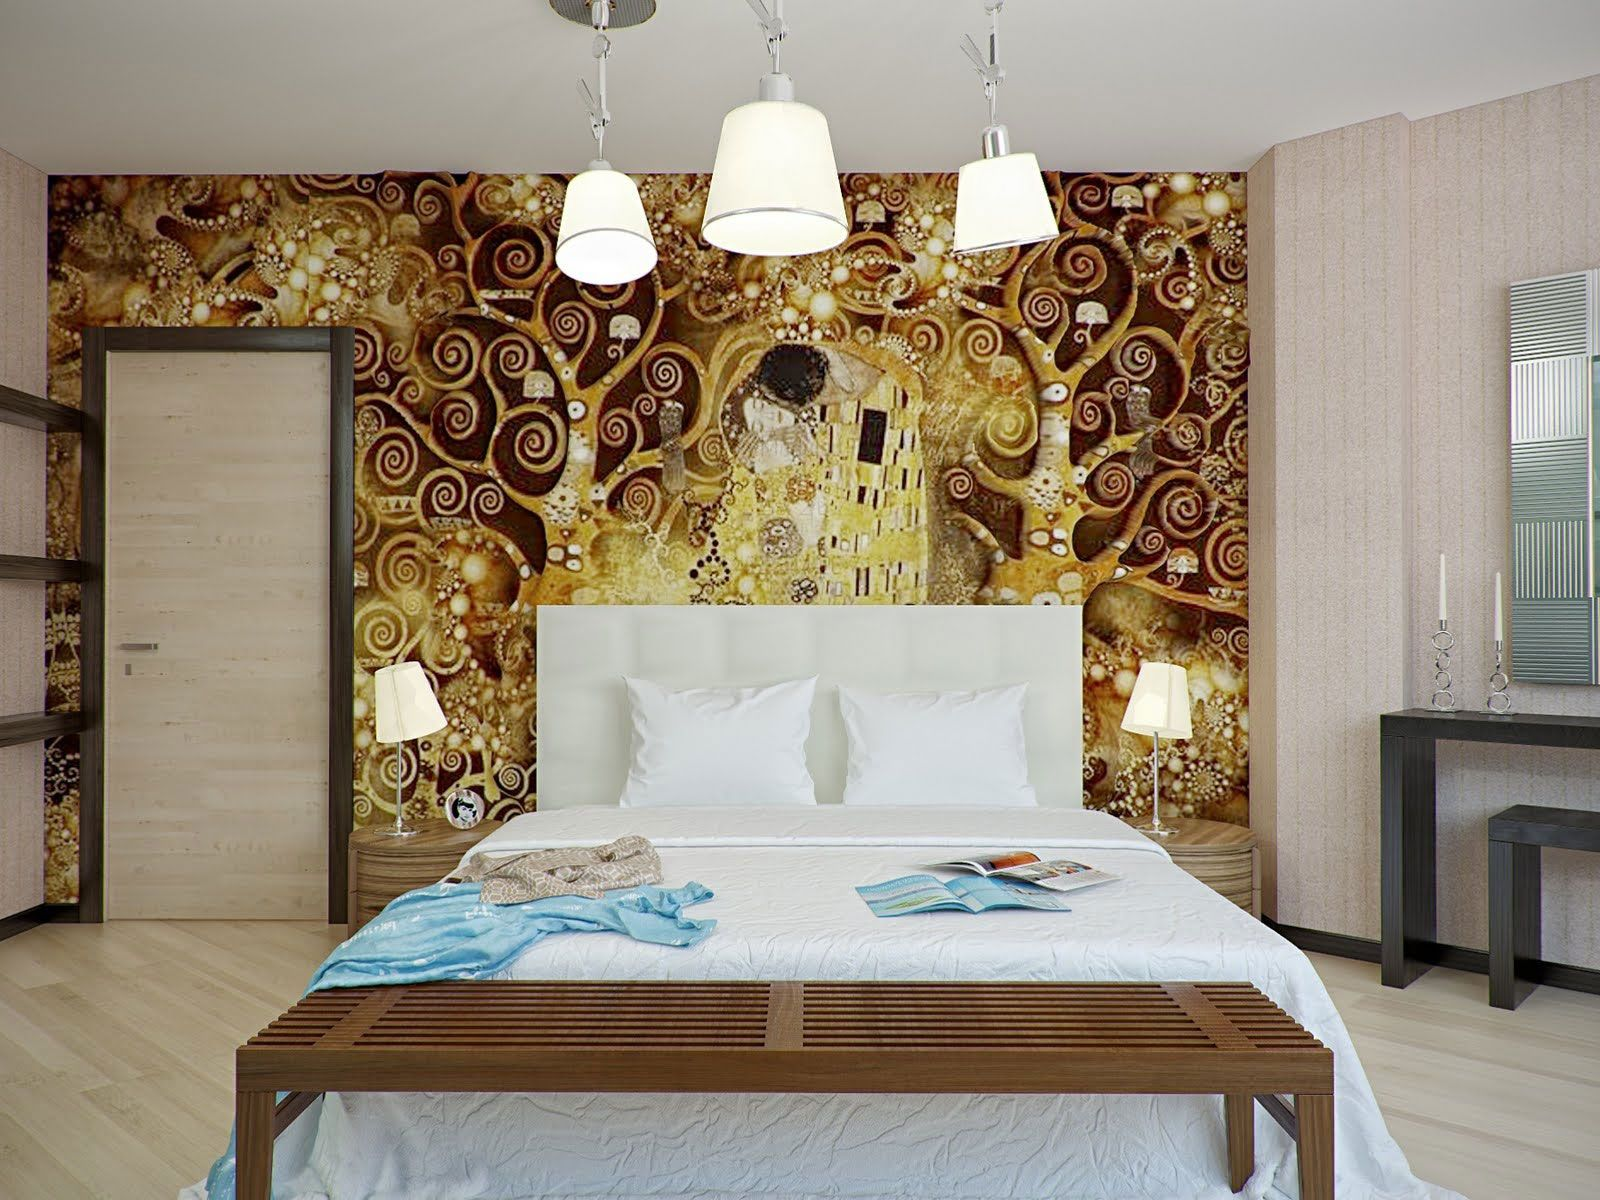 Get Inspired By Gustav Klimt Artwork For Home Interior Design